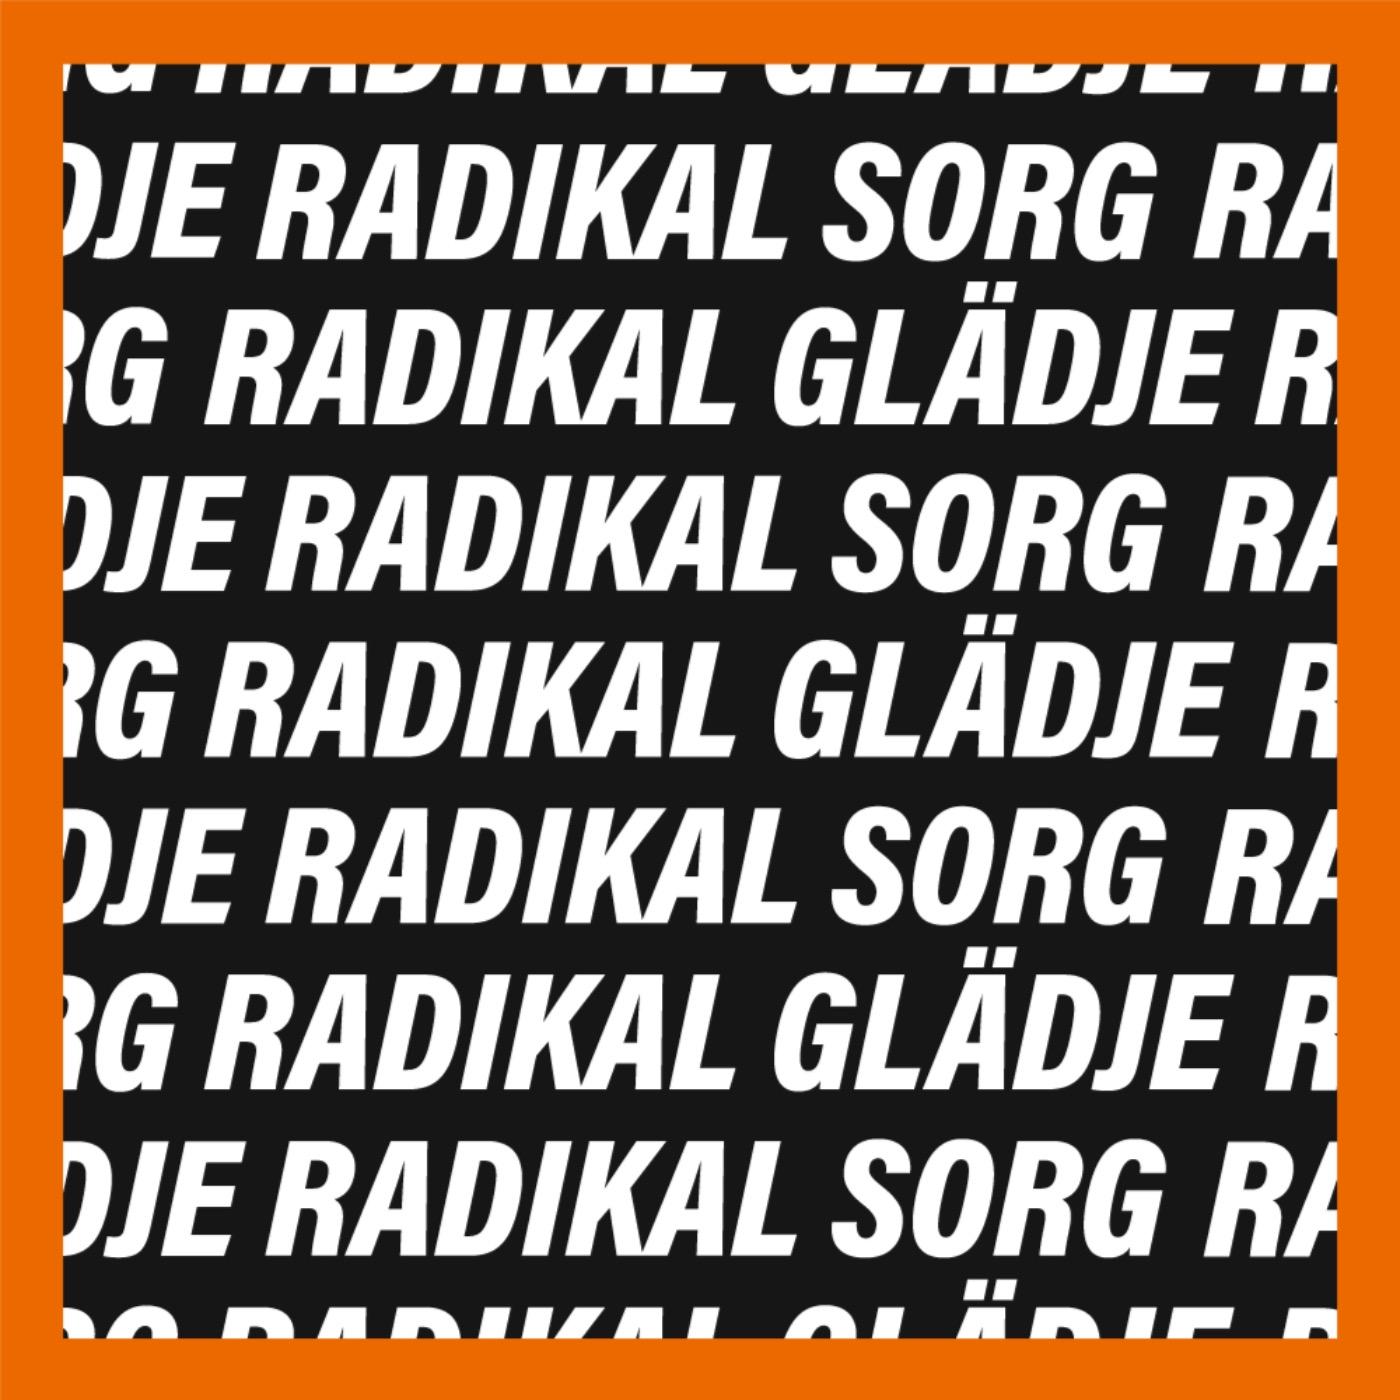 Radikal glädje, radikal sorg